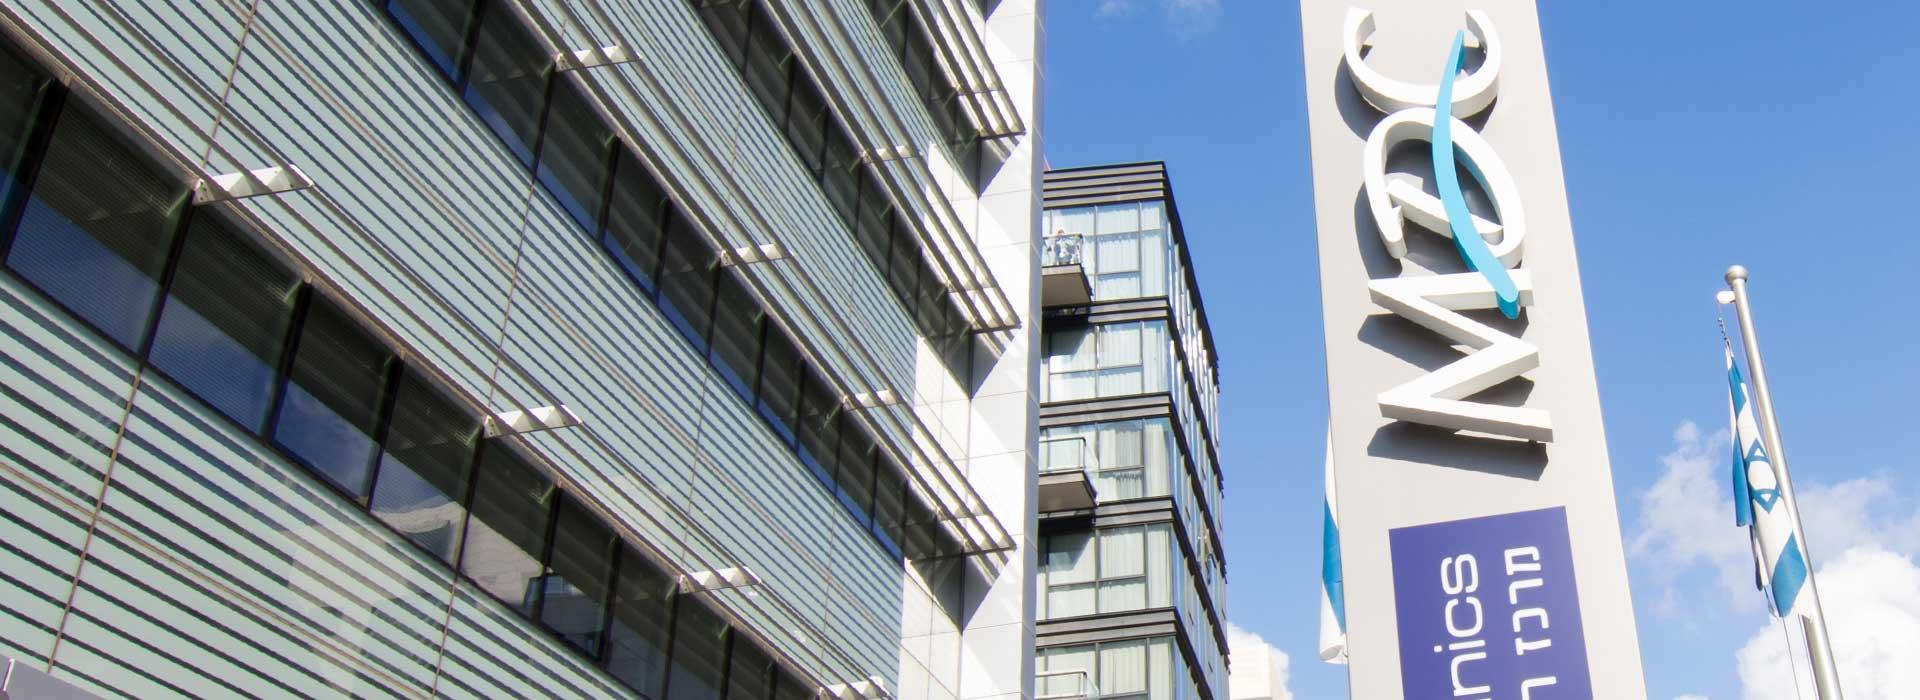 sliders-buildings-medical-clinic